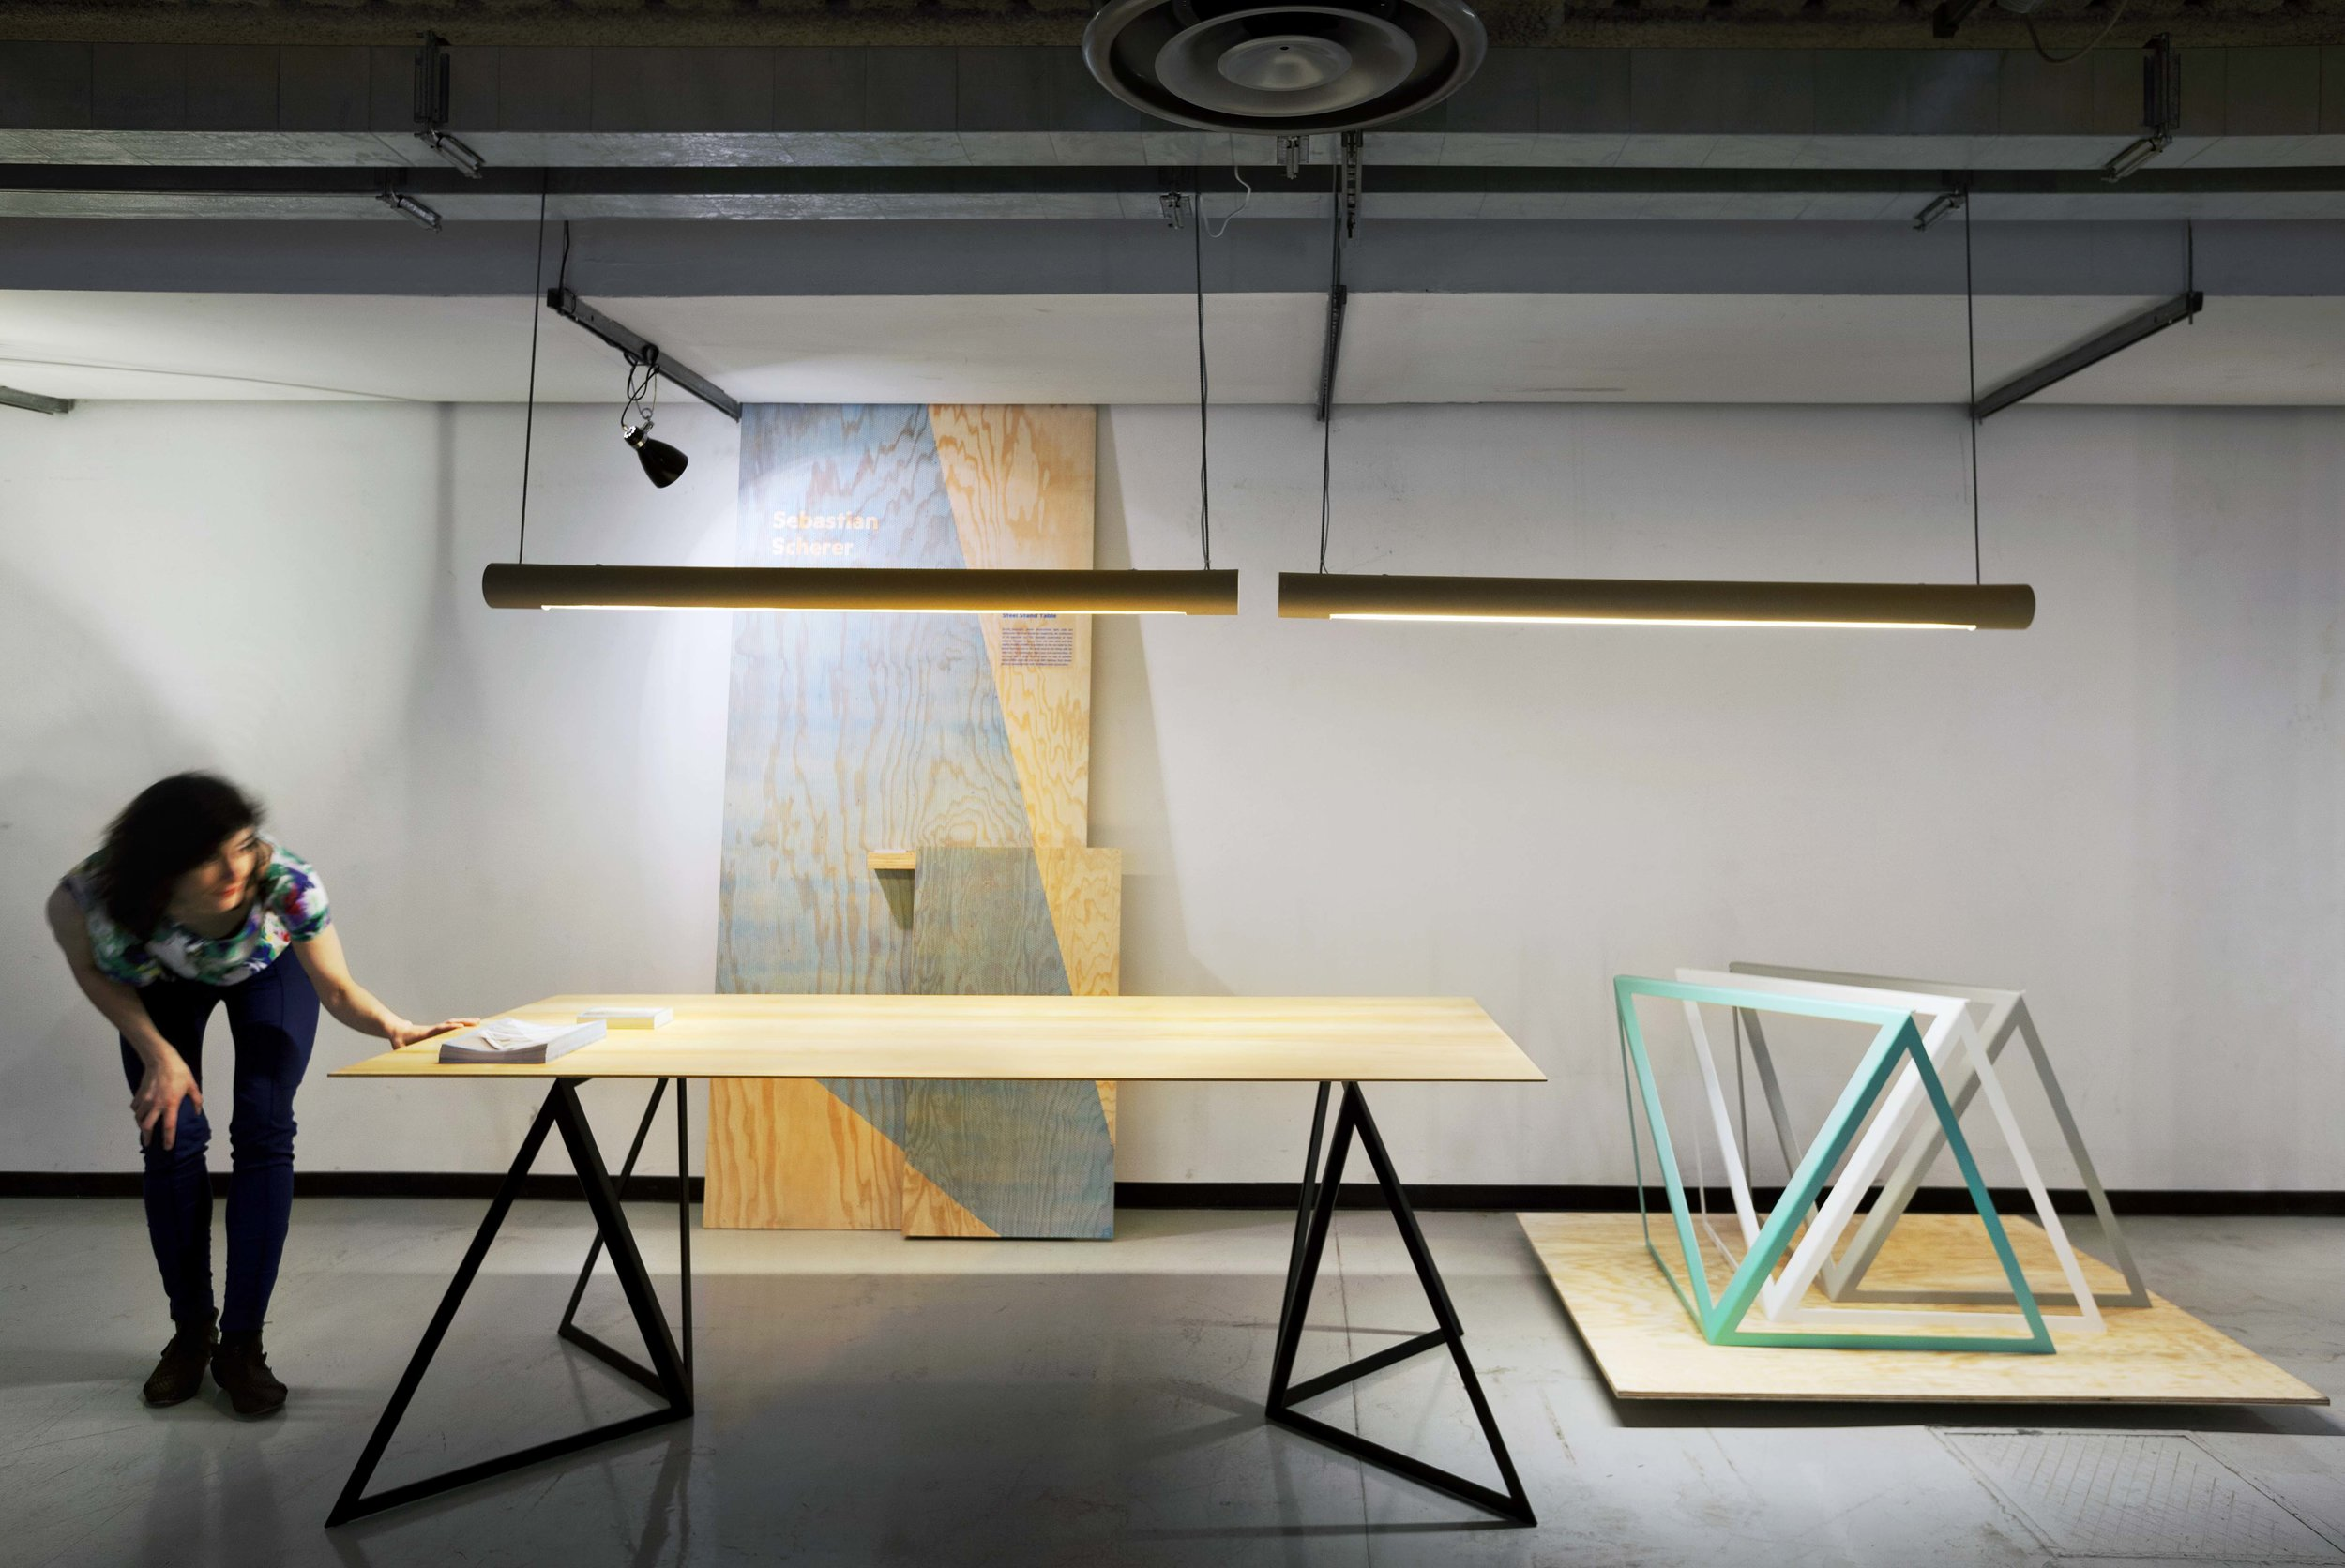 berlin-design-selection-milan_tradefair-exhibition-design_coordination-berlin__03.jpg